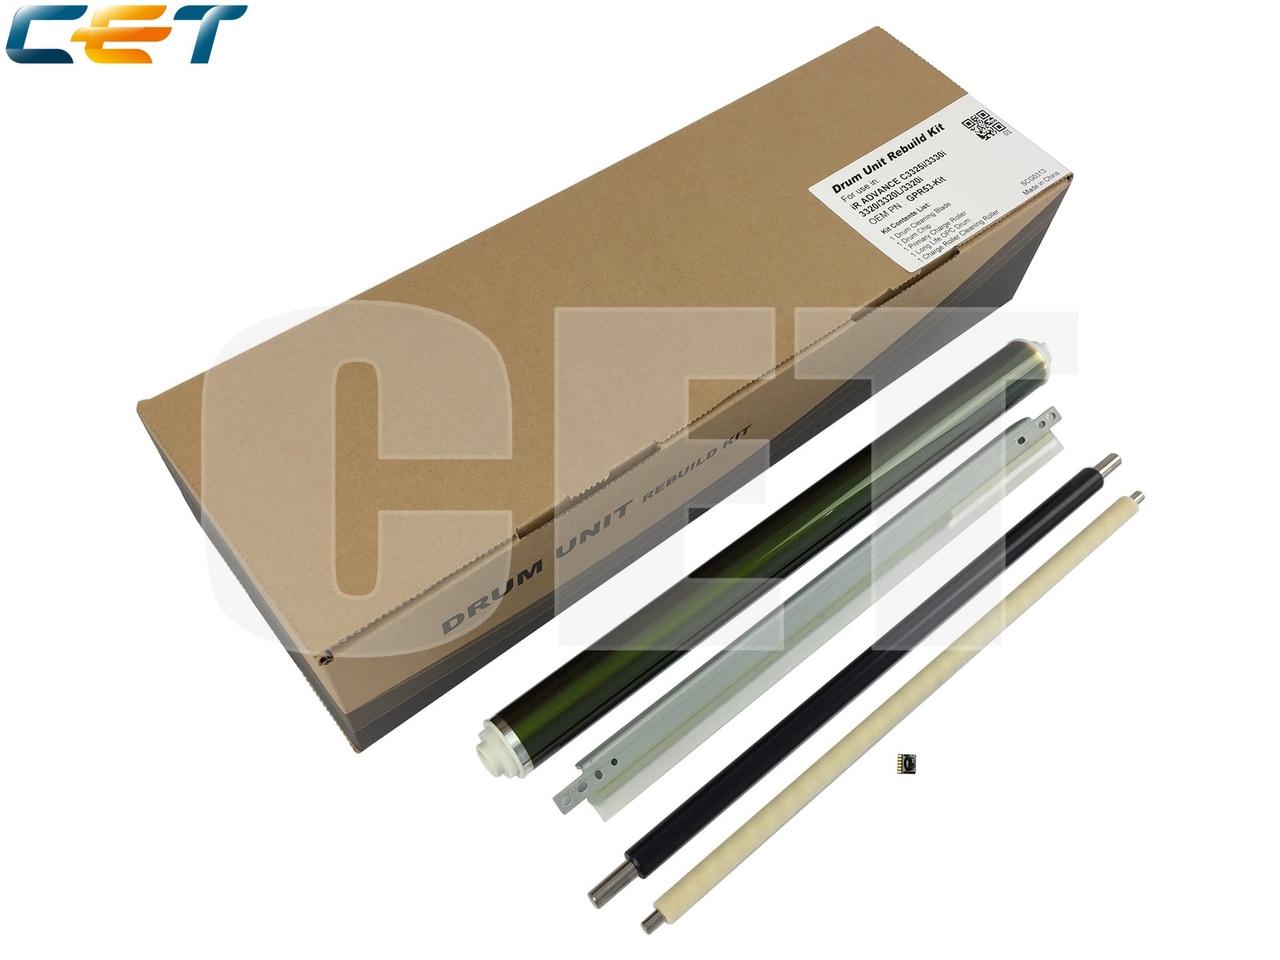 Комплект восстановления драм-юнита C-EXV49 для CANON iRADVANCE C3325i/3330i/3320/3320L/3320i (CET), 110000 стр.,CET5279